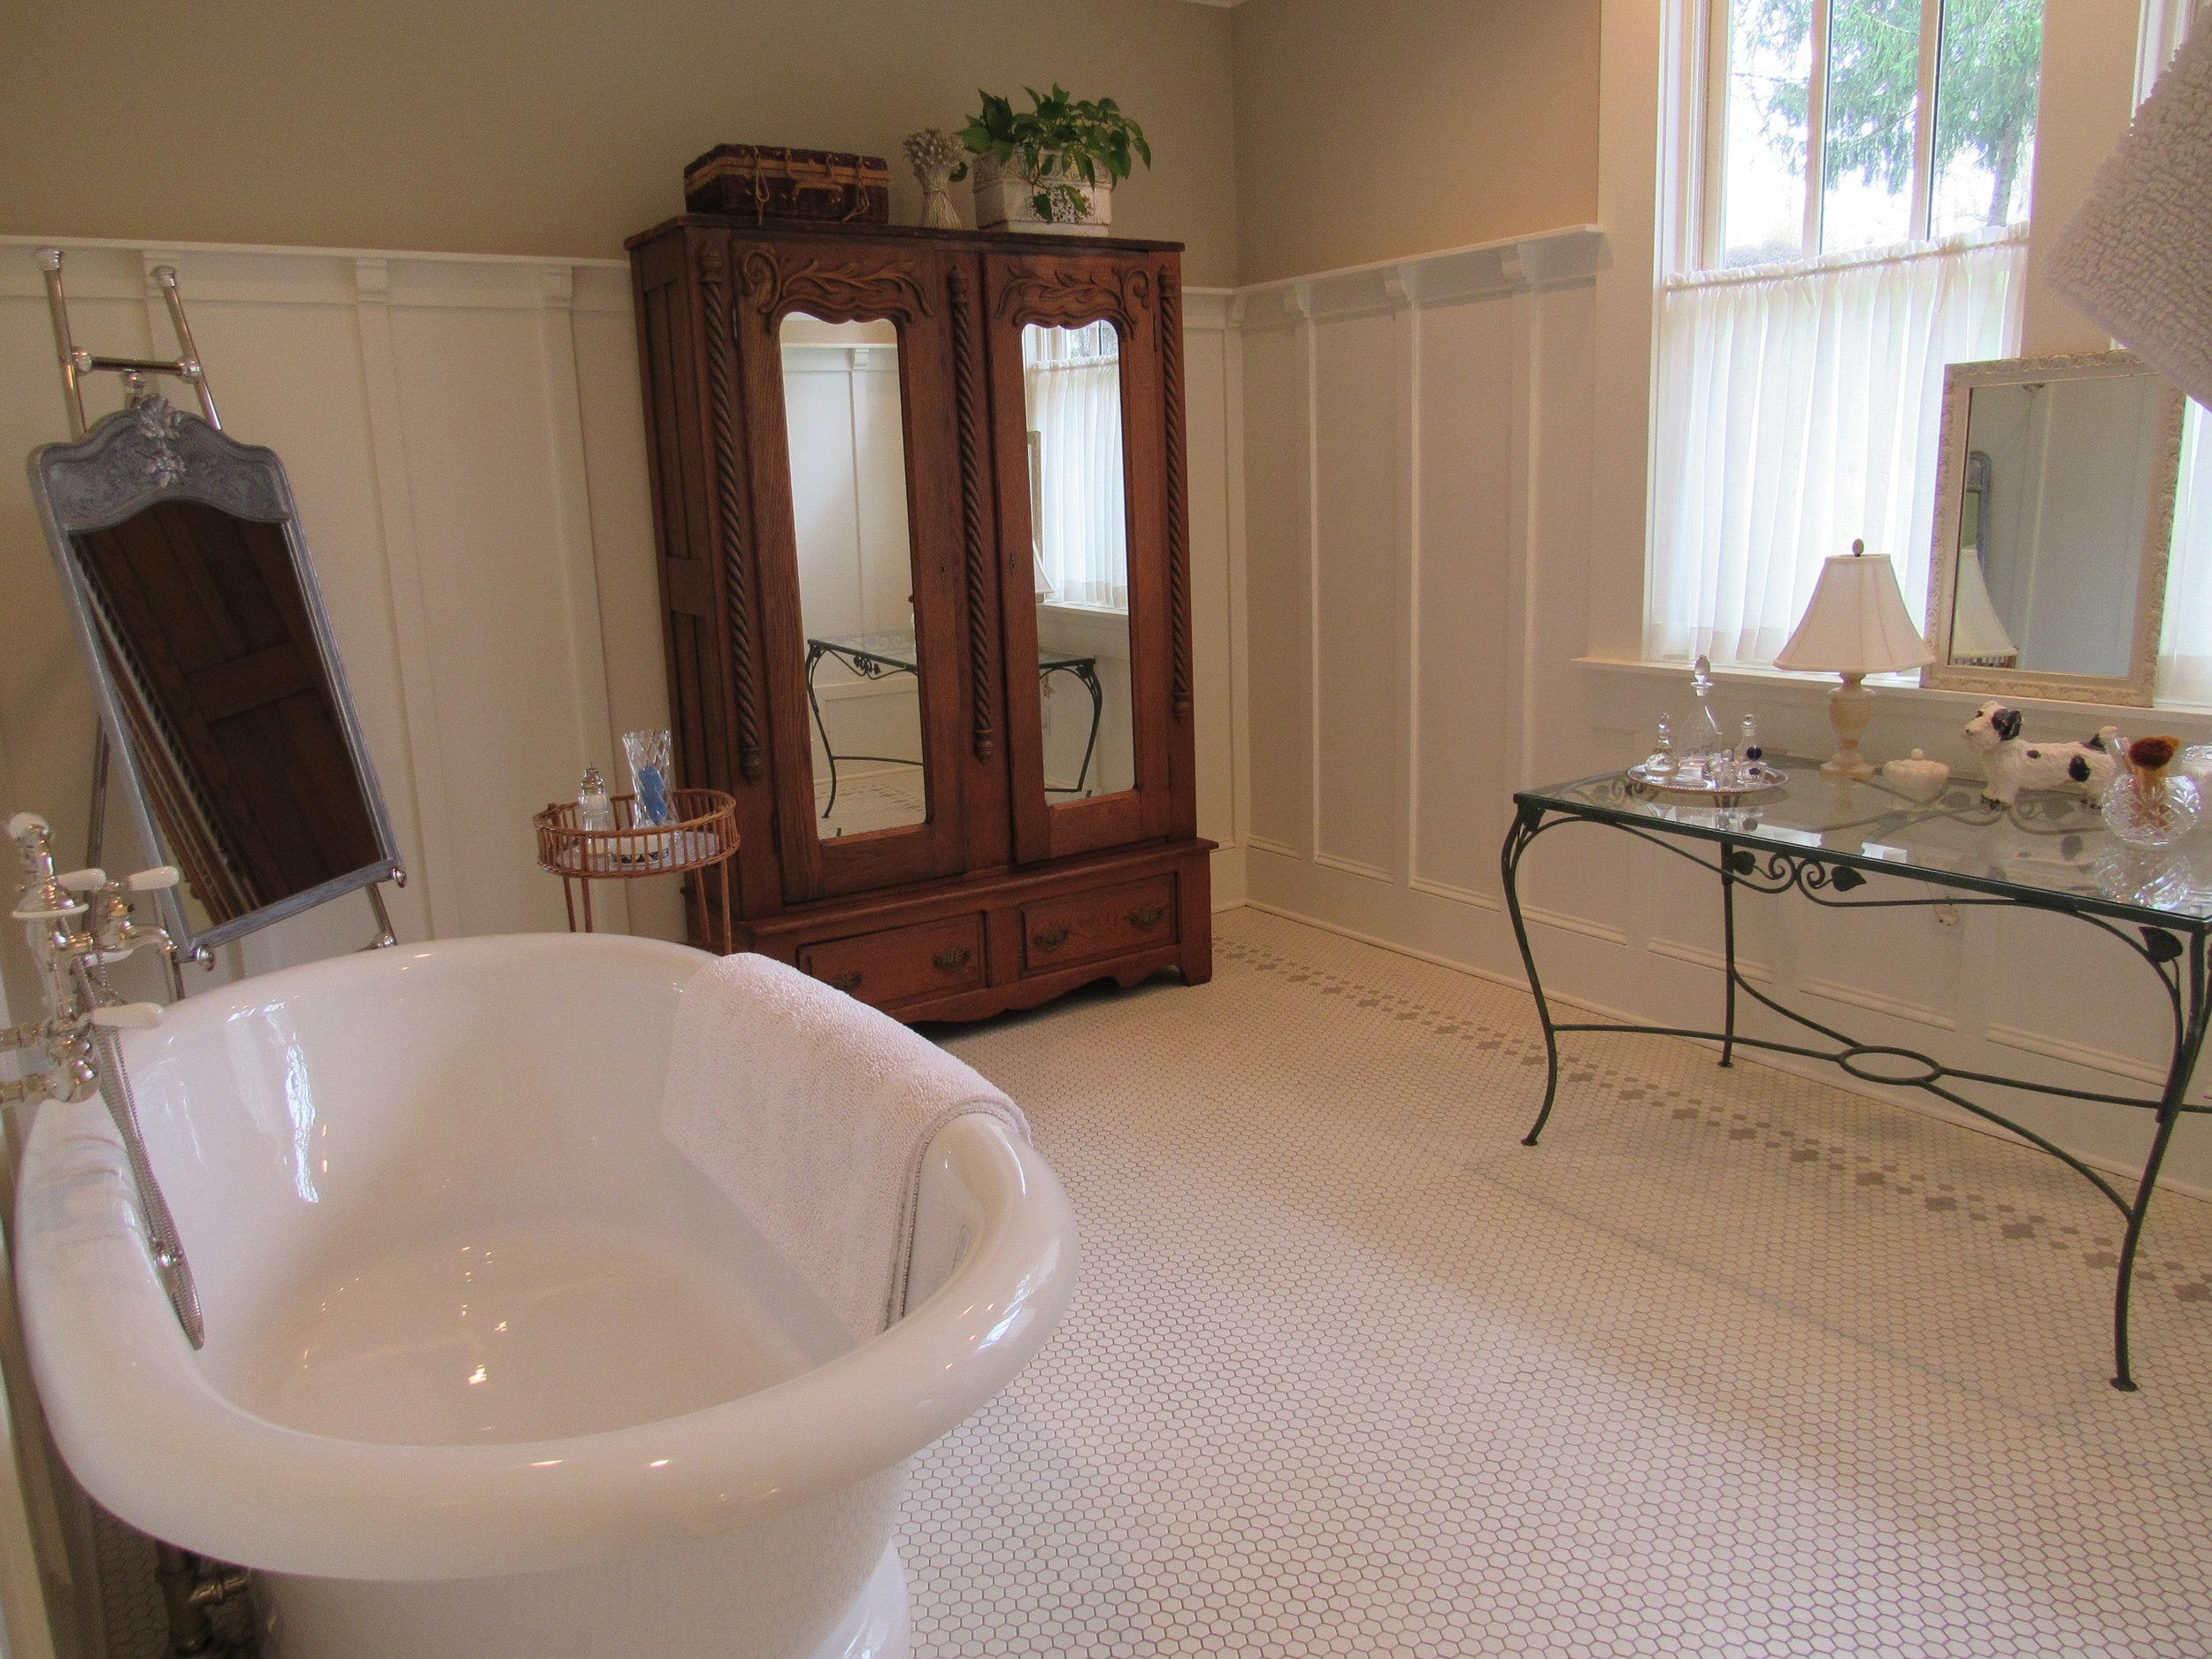 Bath Tub/Shower/Dressing Room